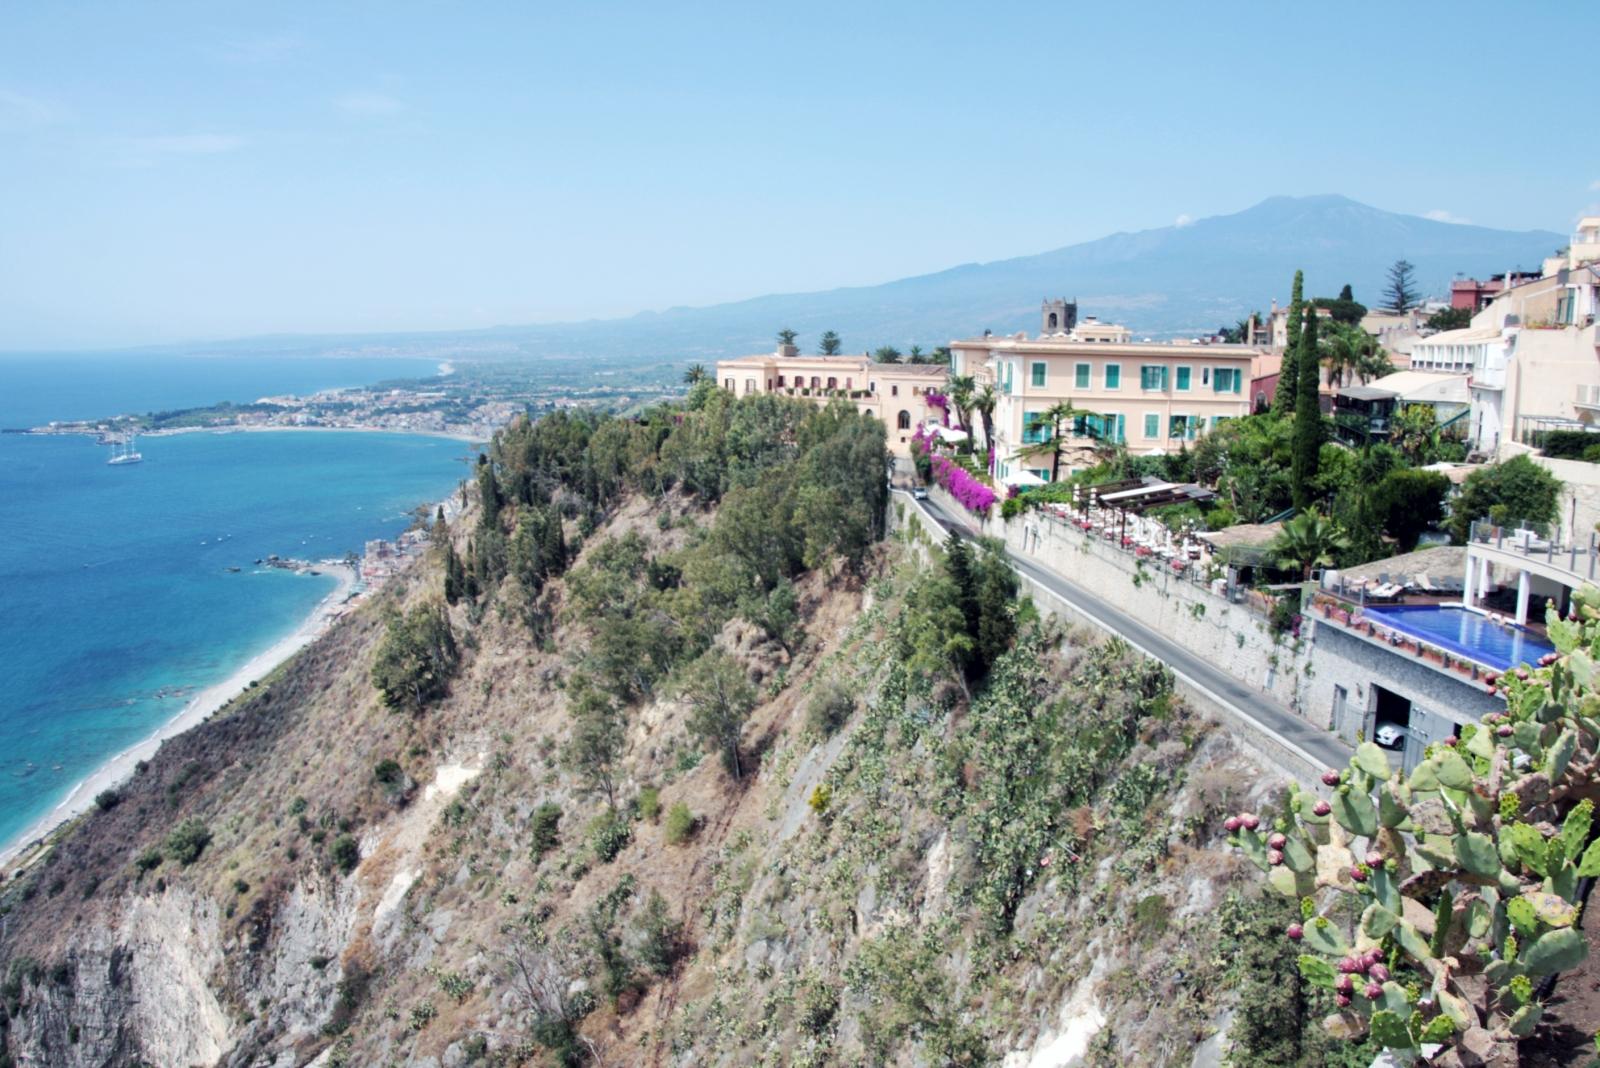 Residence taormina villa oasis finest apartments and suites in sicily - La finestra sul mare taormina ...